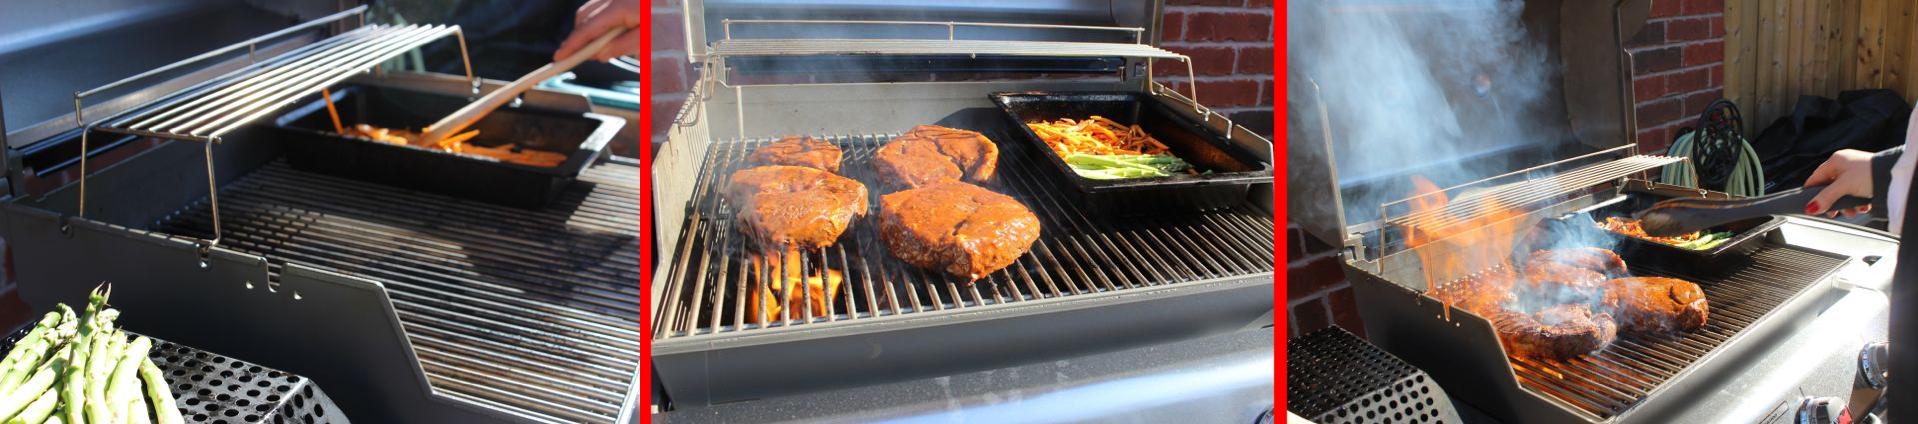 weber genesis ep330 barbecue